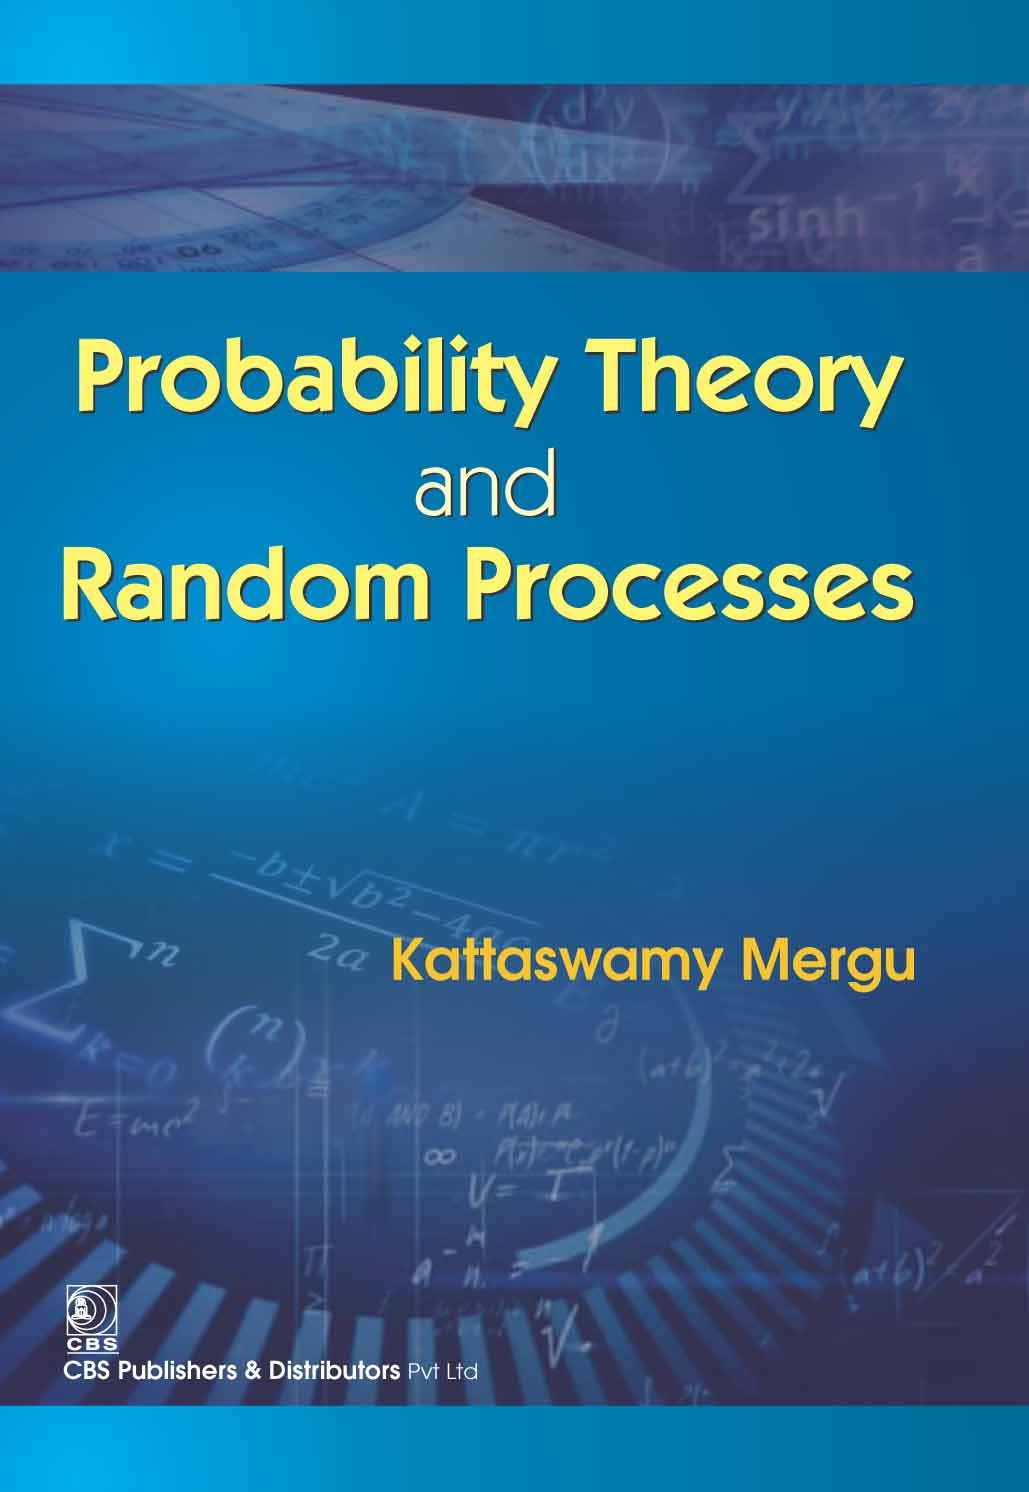 PROBABILITY THEORY AND RANDOM PROCESSES (PB 2017)